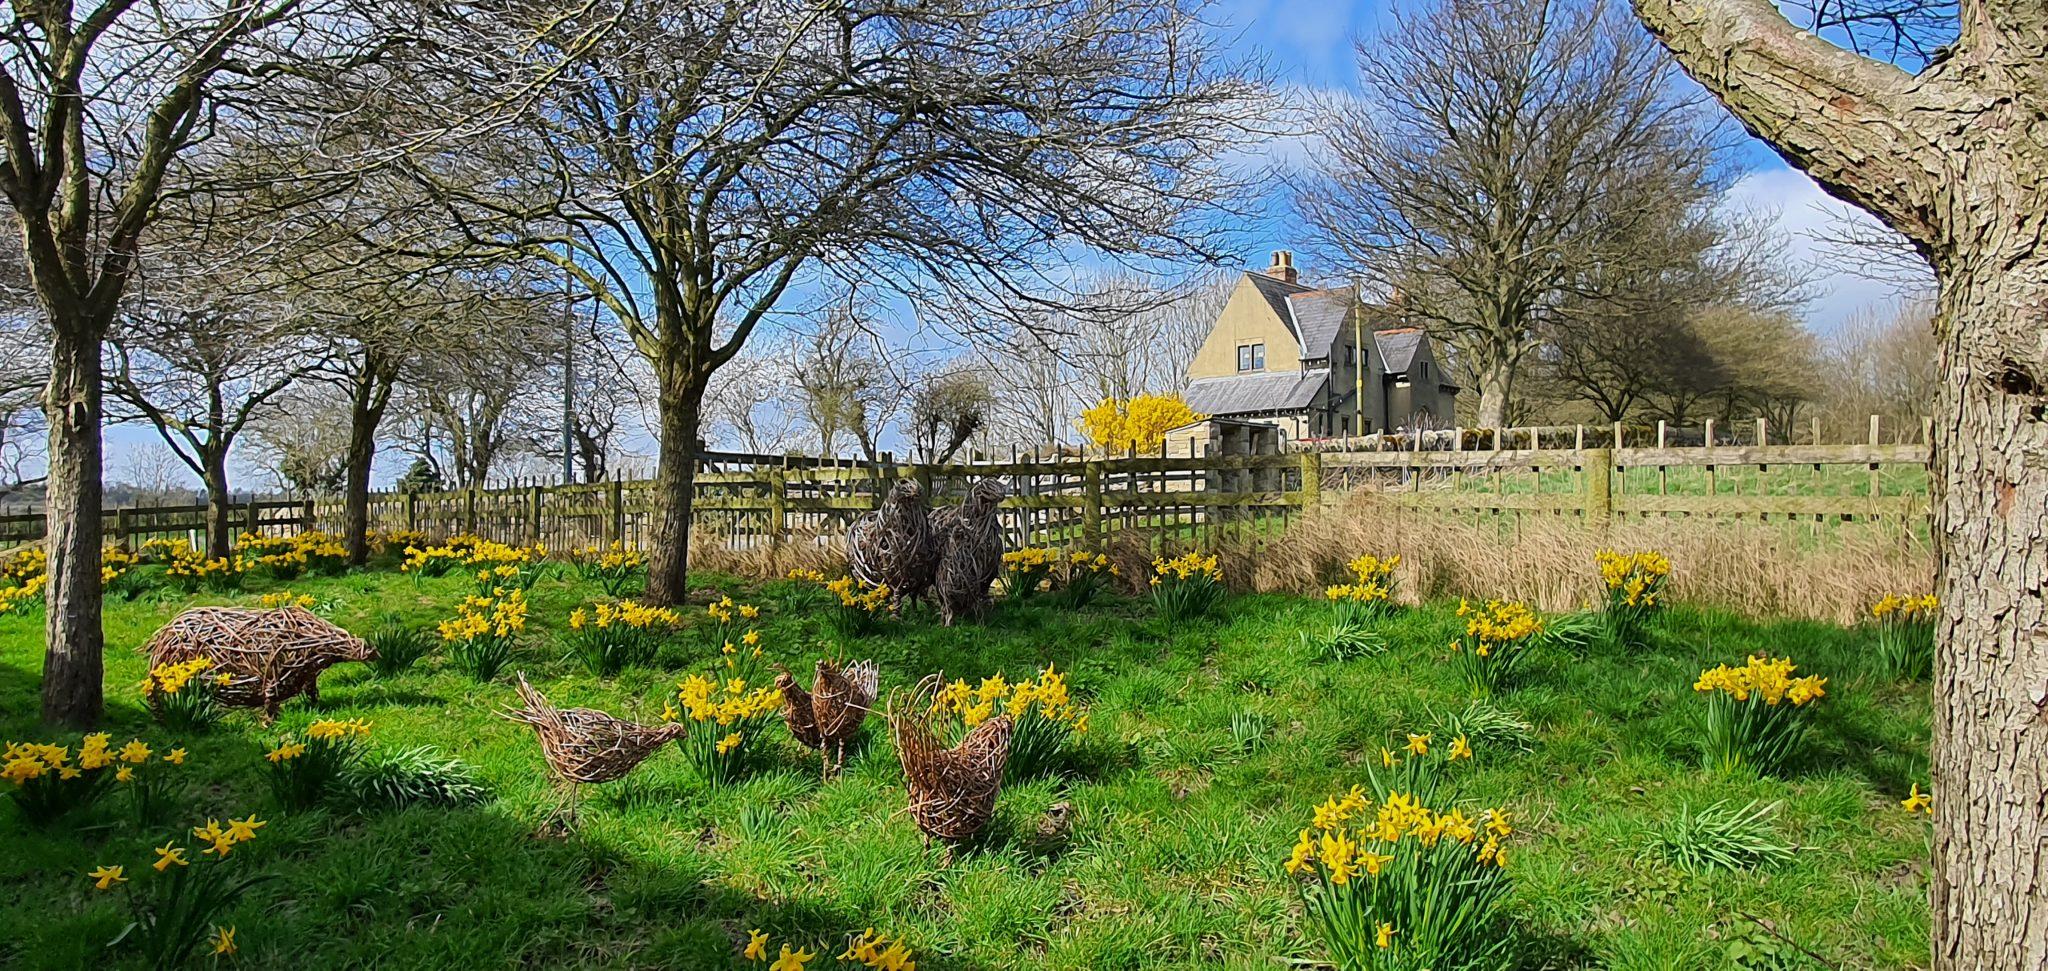 Wiosna w Fountains Abbey